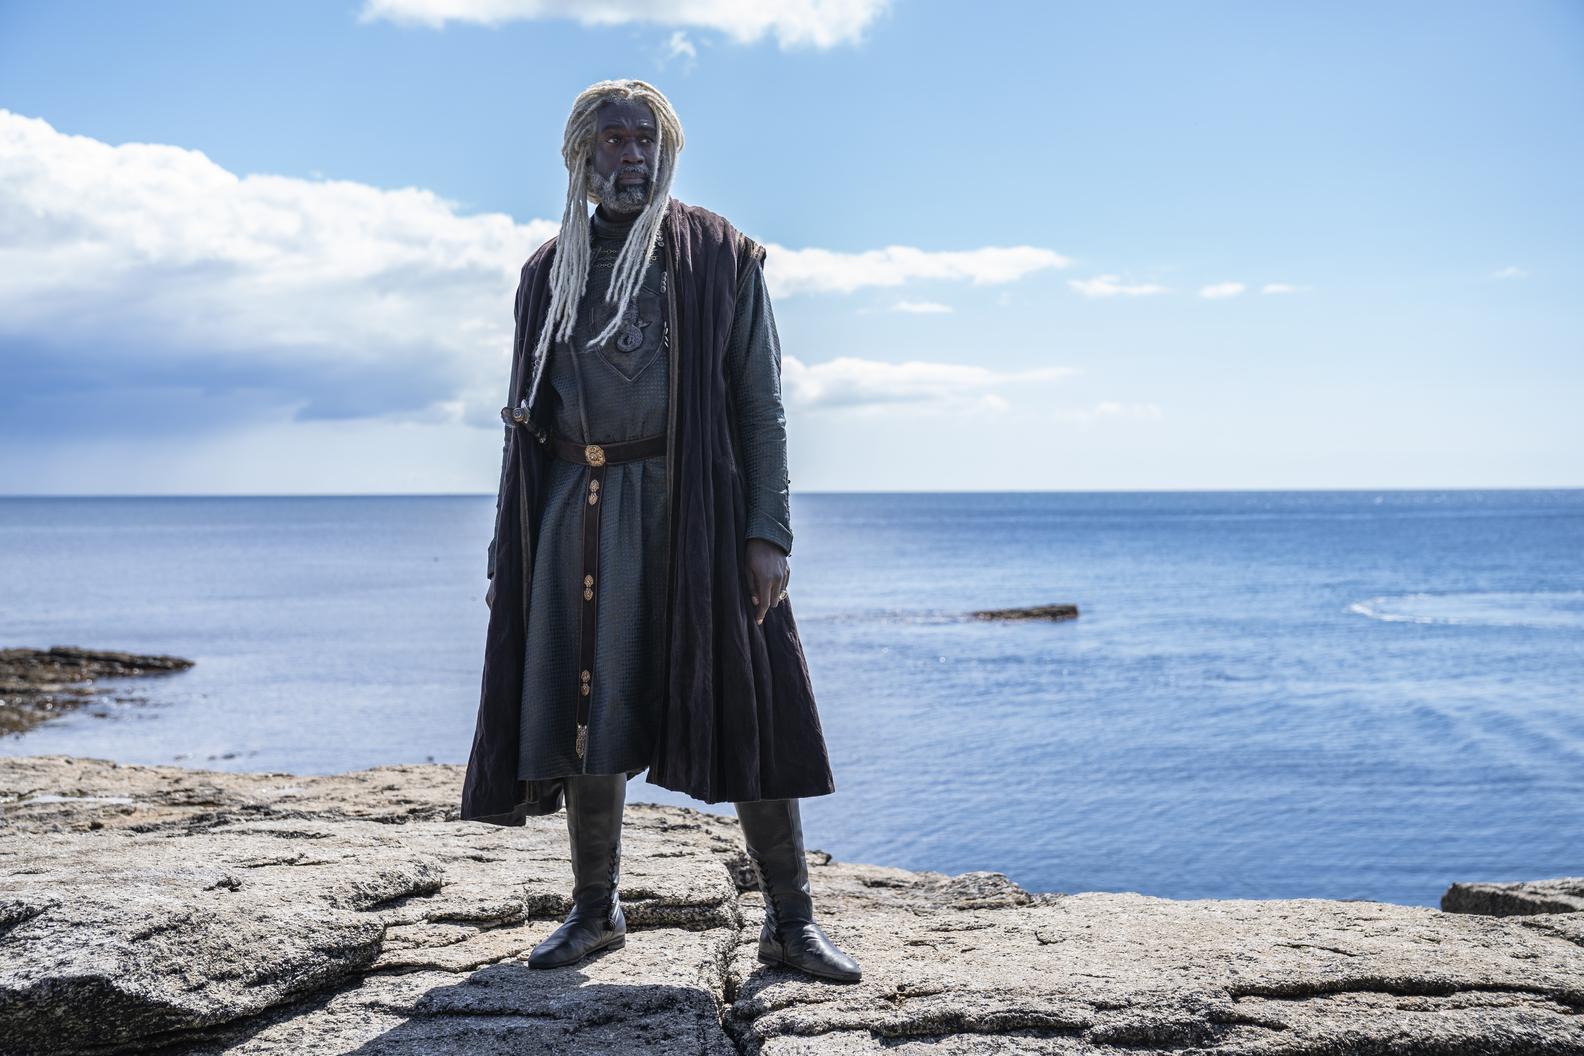 O ator Steve Toussaint como Lord Corlys Velaryon, 'The Sea Snake', na série 'House of the Dragons'